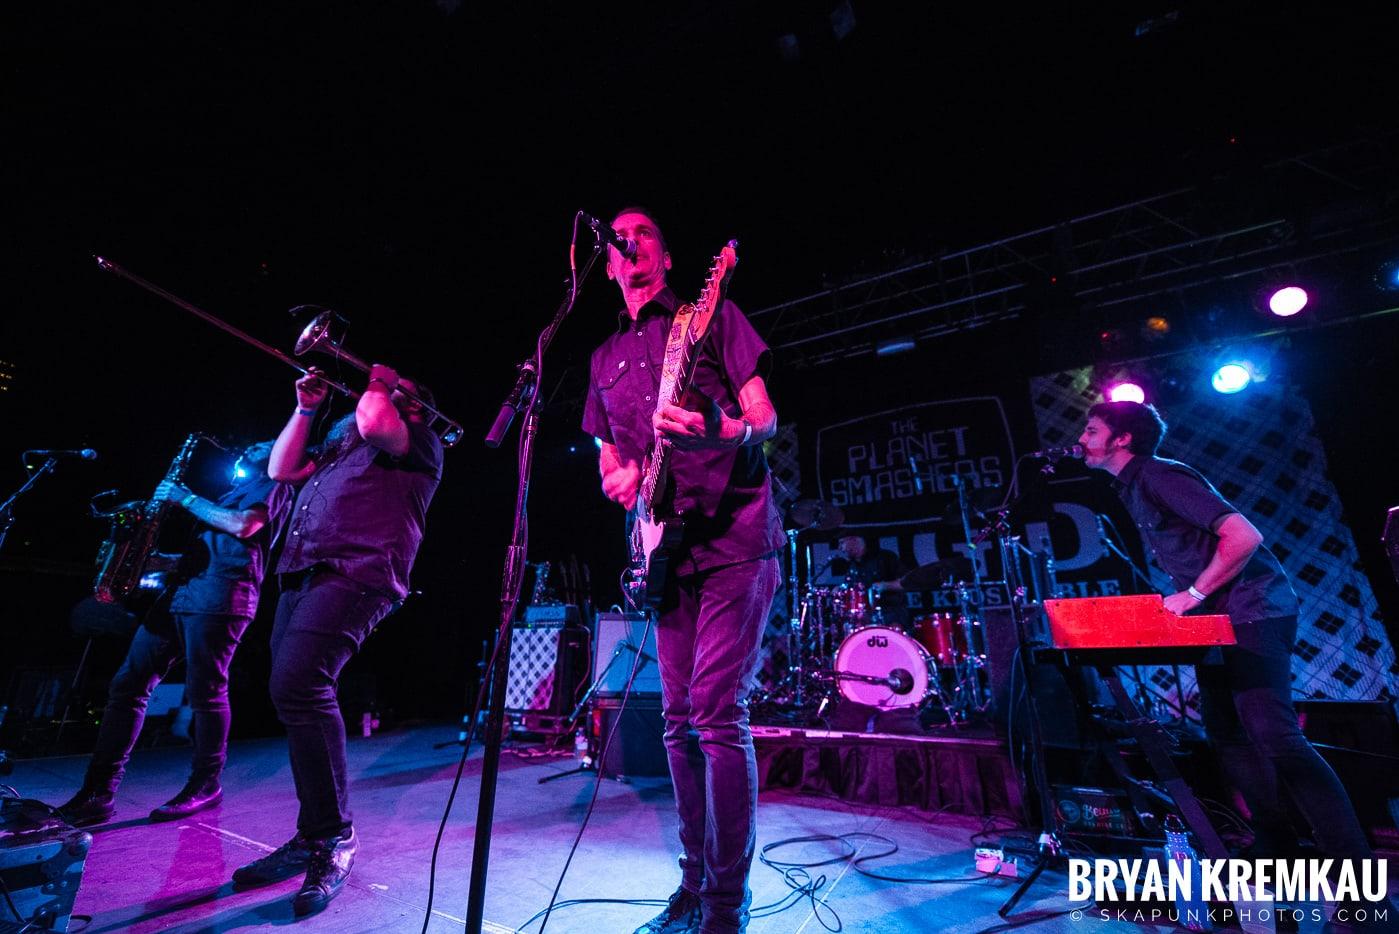 The Planet Smashers @ Skanksgiving, Starland Ballroom, Sayreville, NJ - 11.30.19 (16)